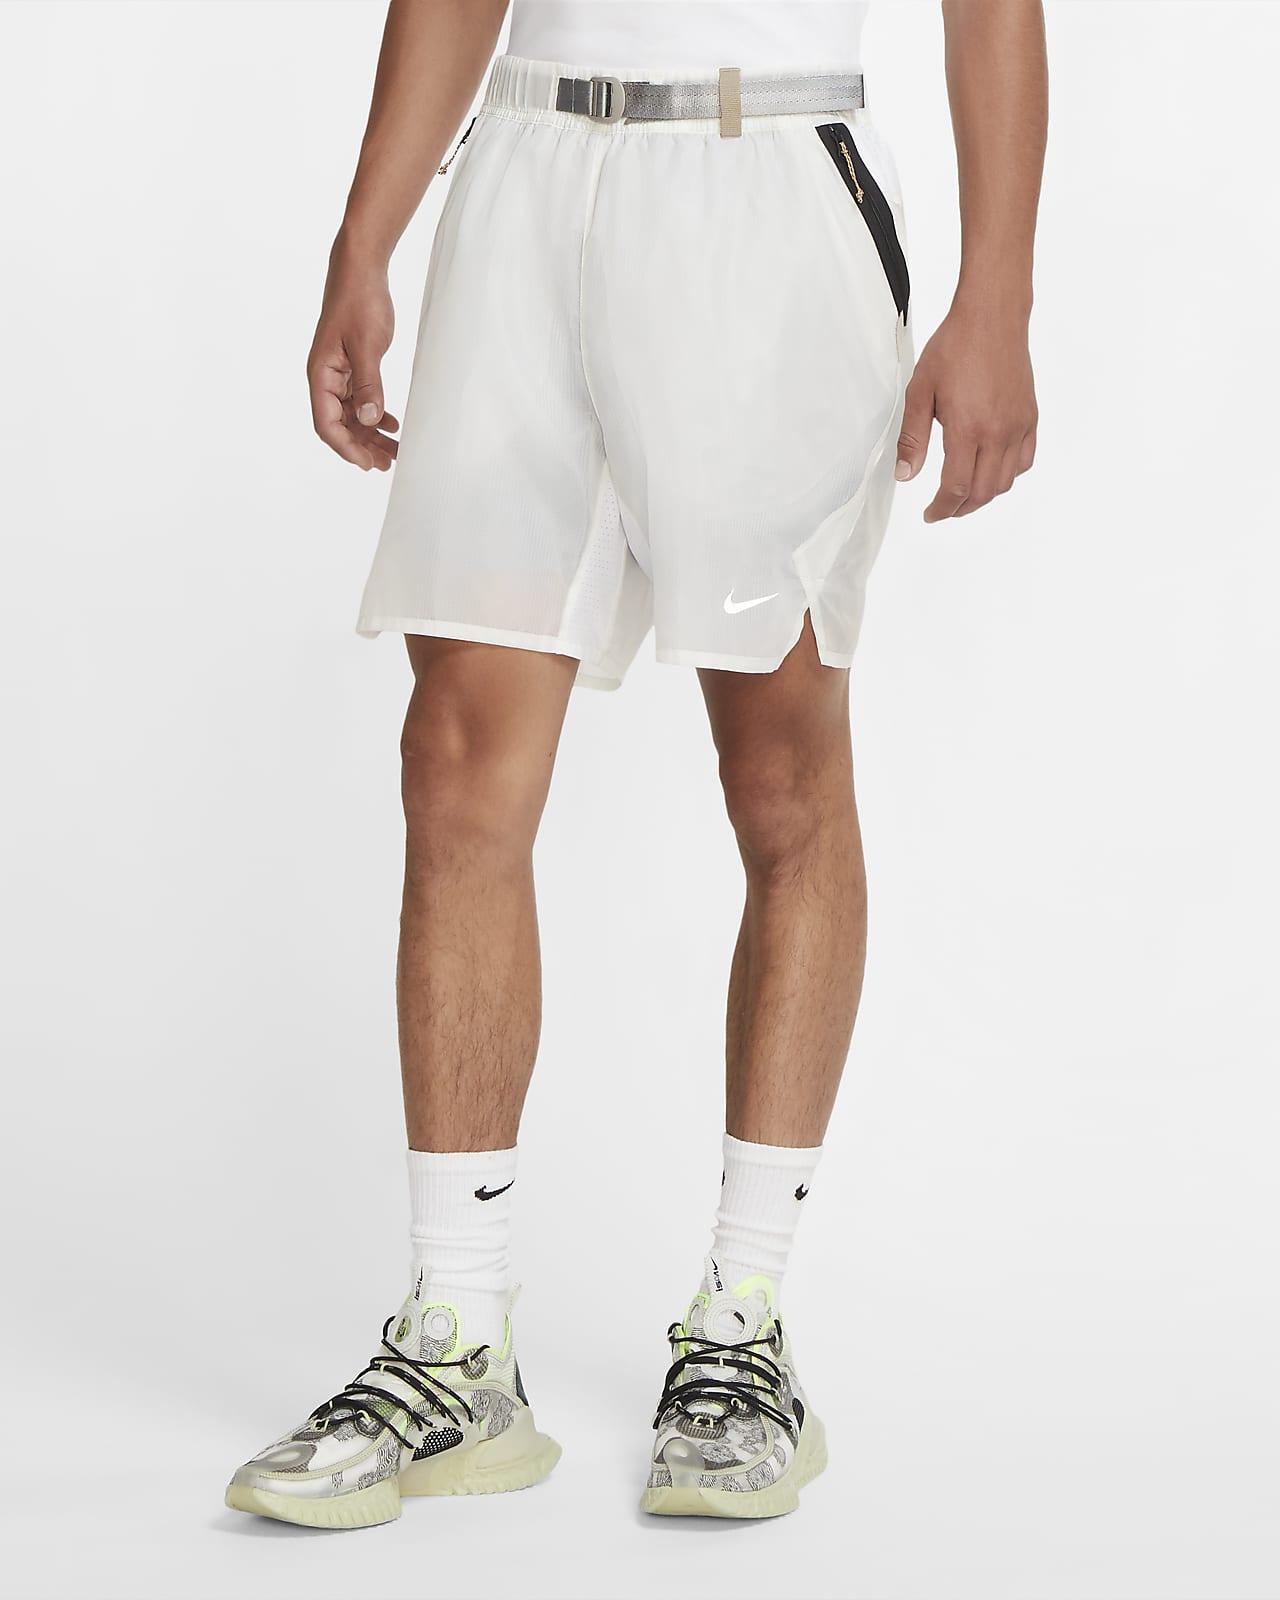 Shorts para hombre Nike ISPA